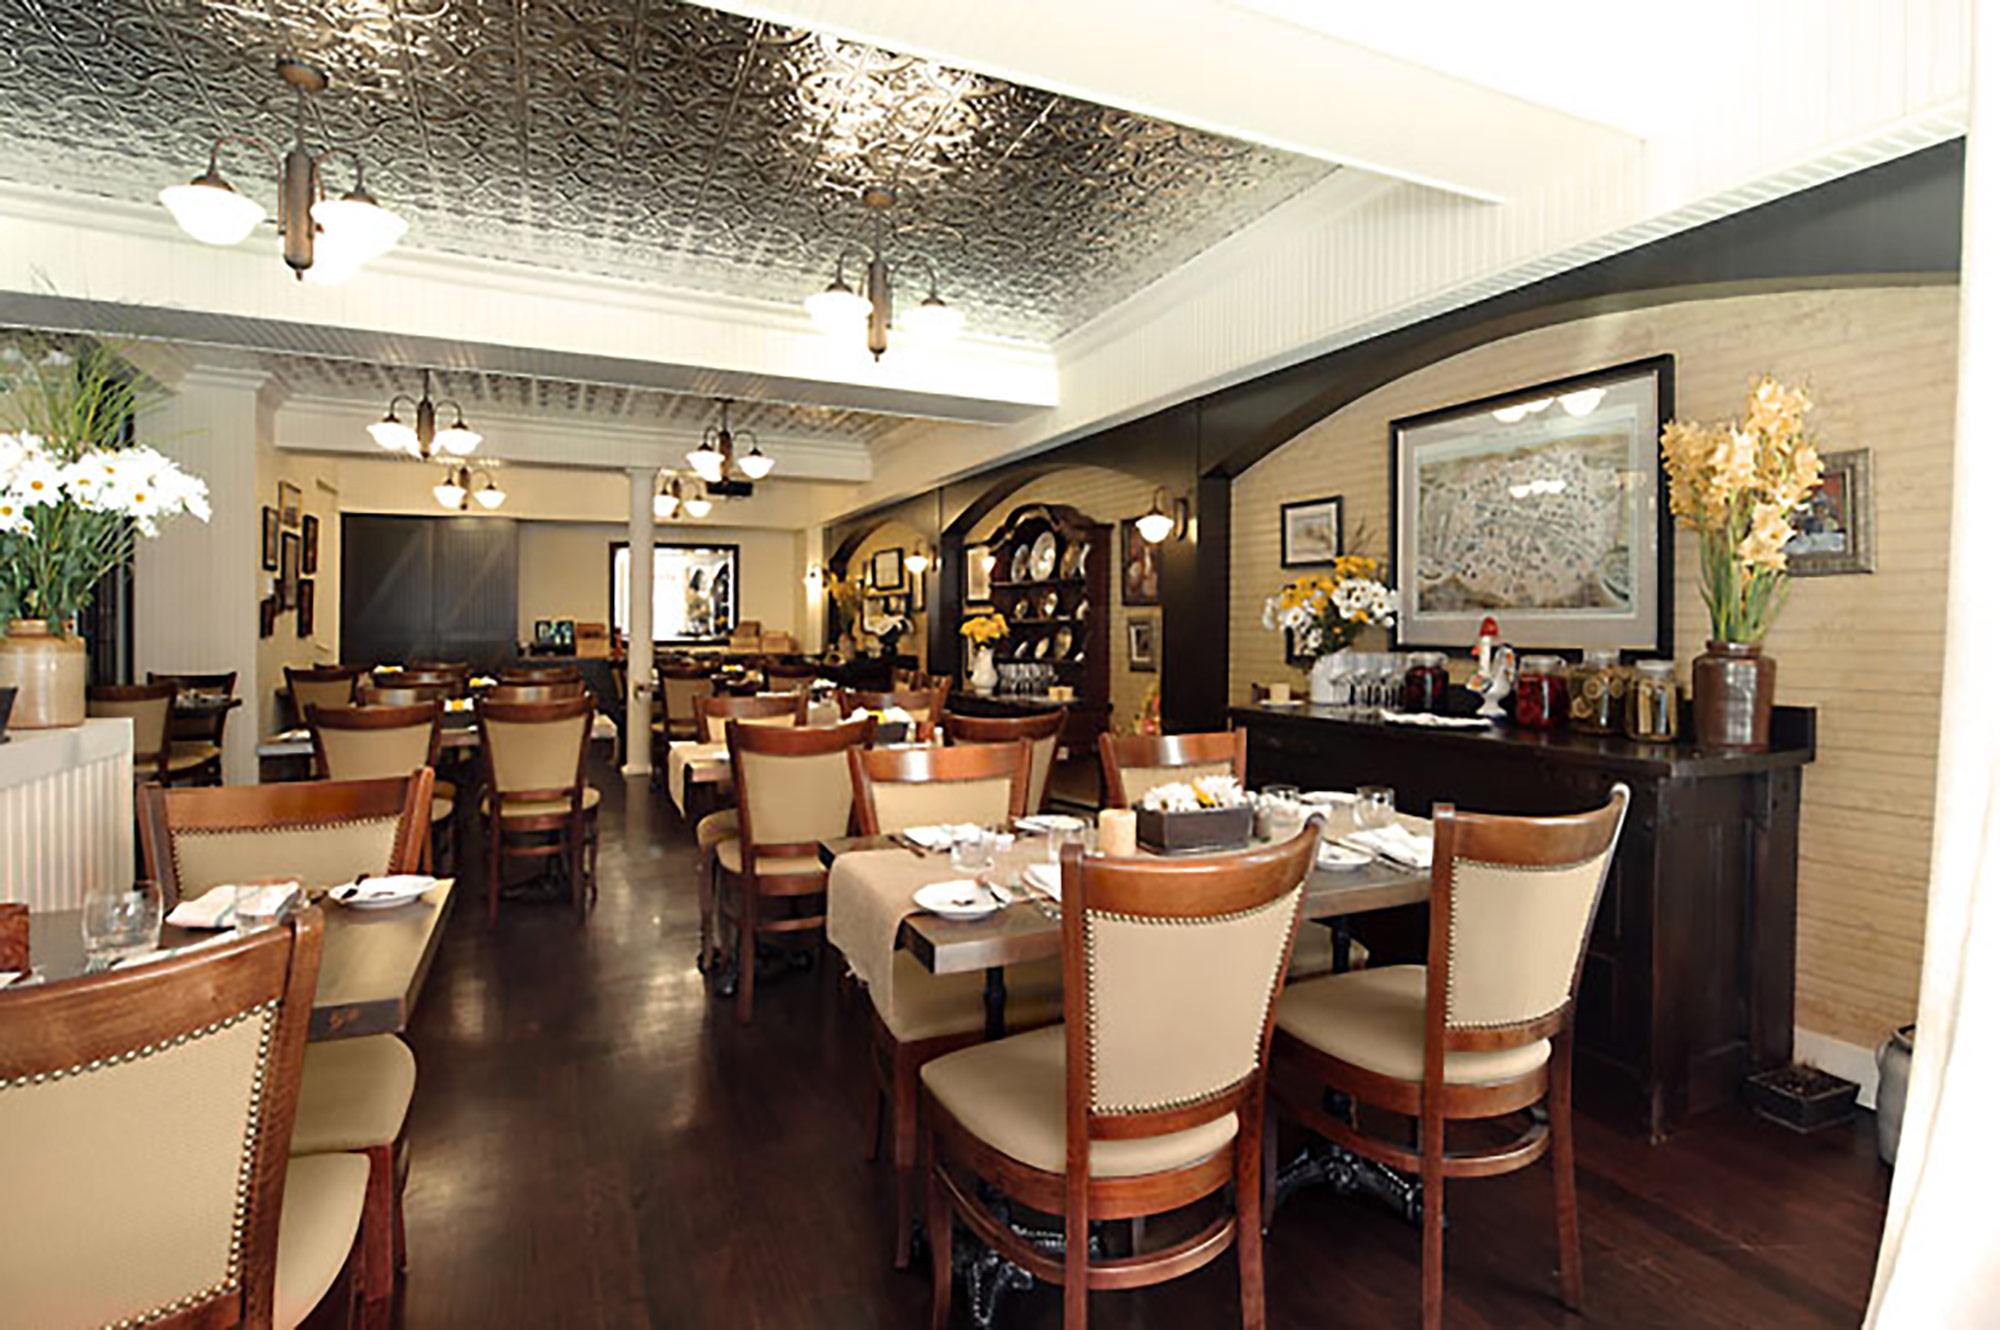 interior-design-french-restaurant-bar-dining-room.jpg